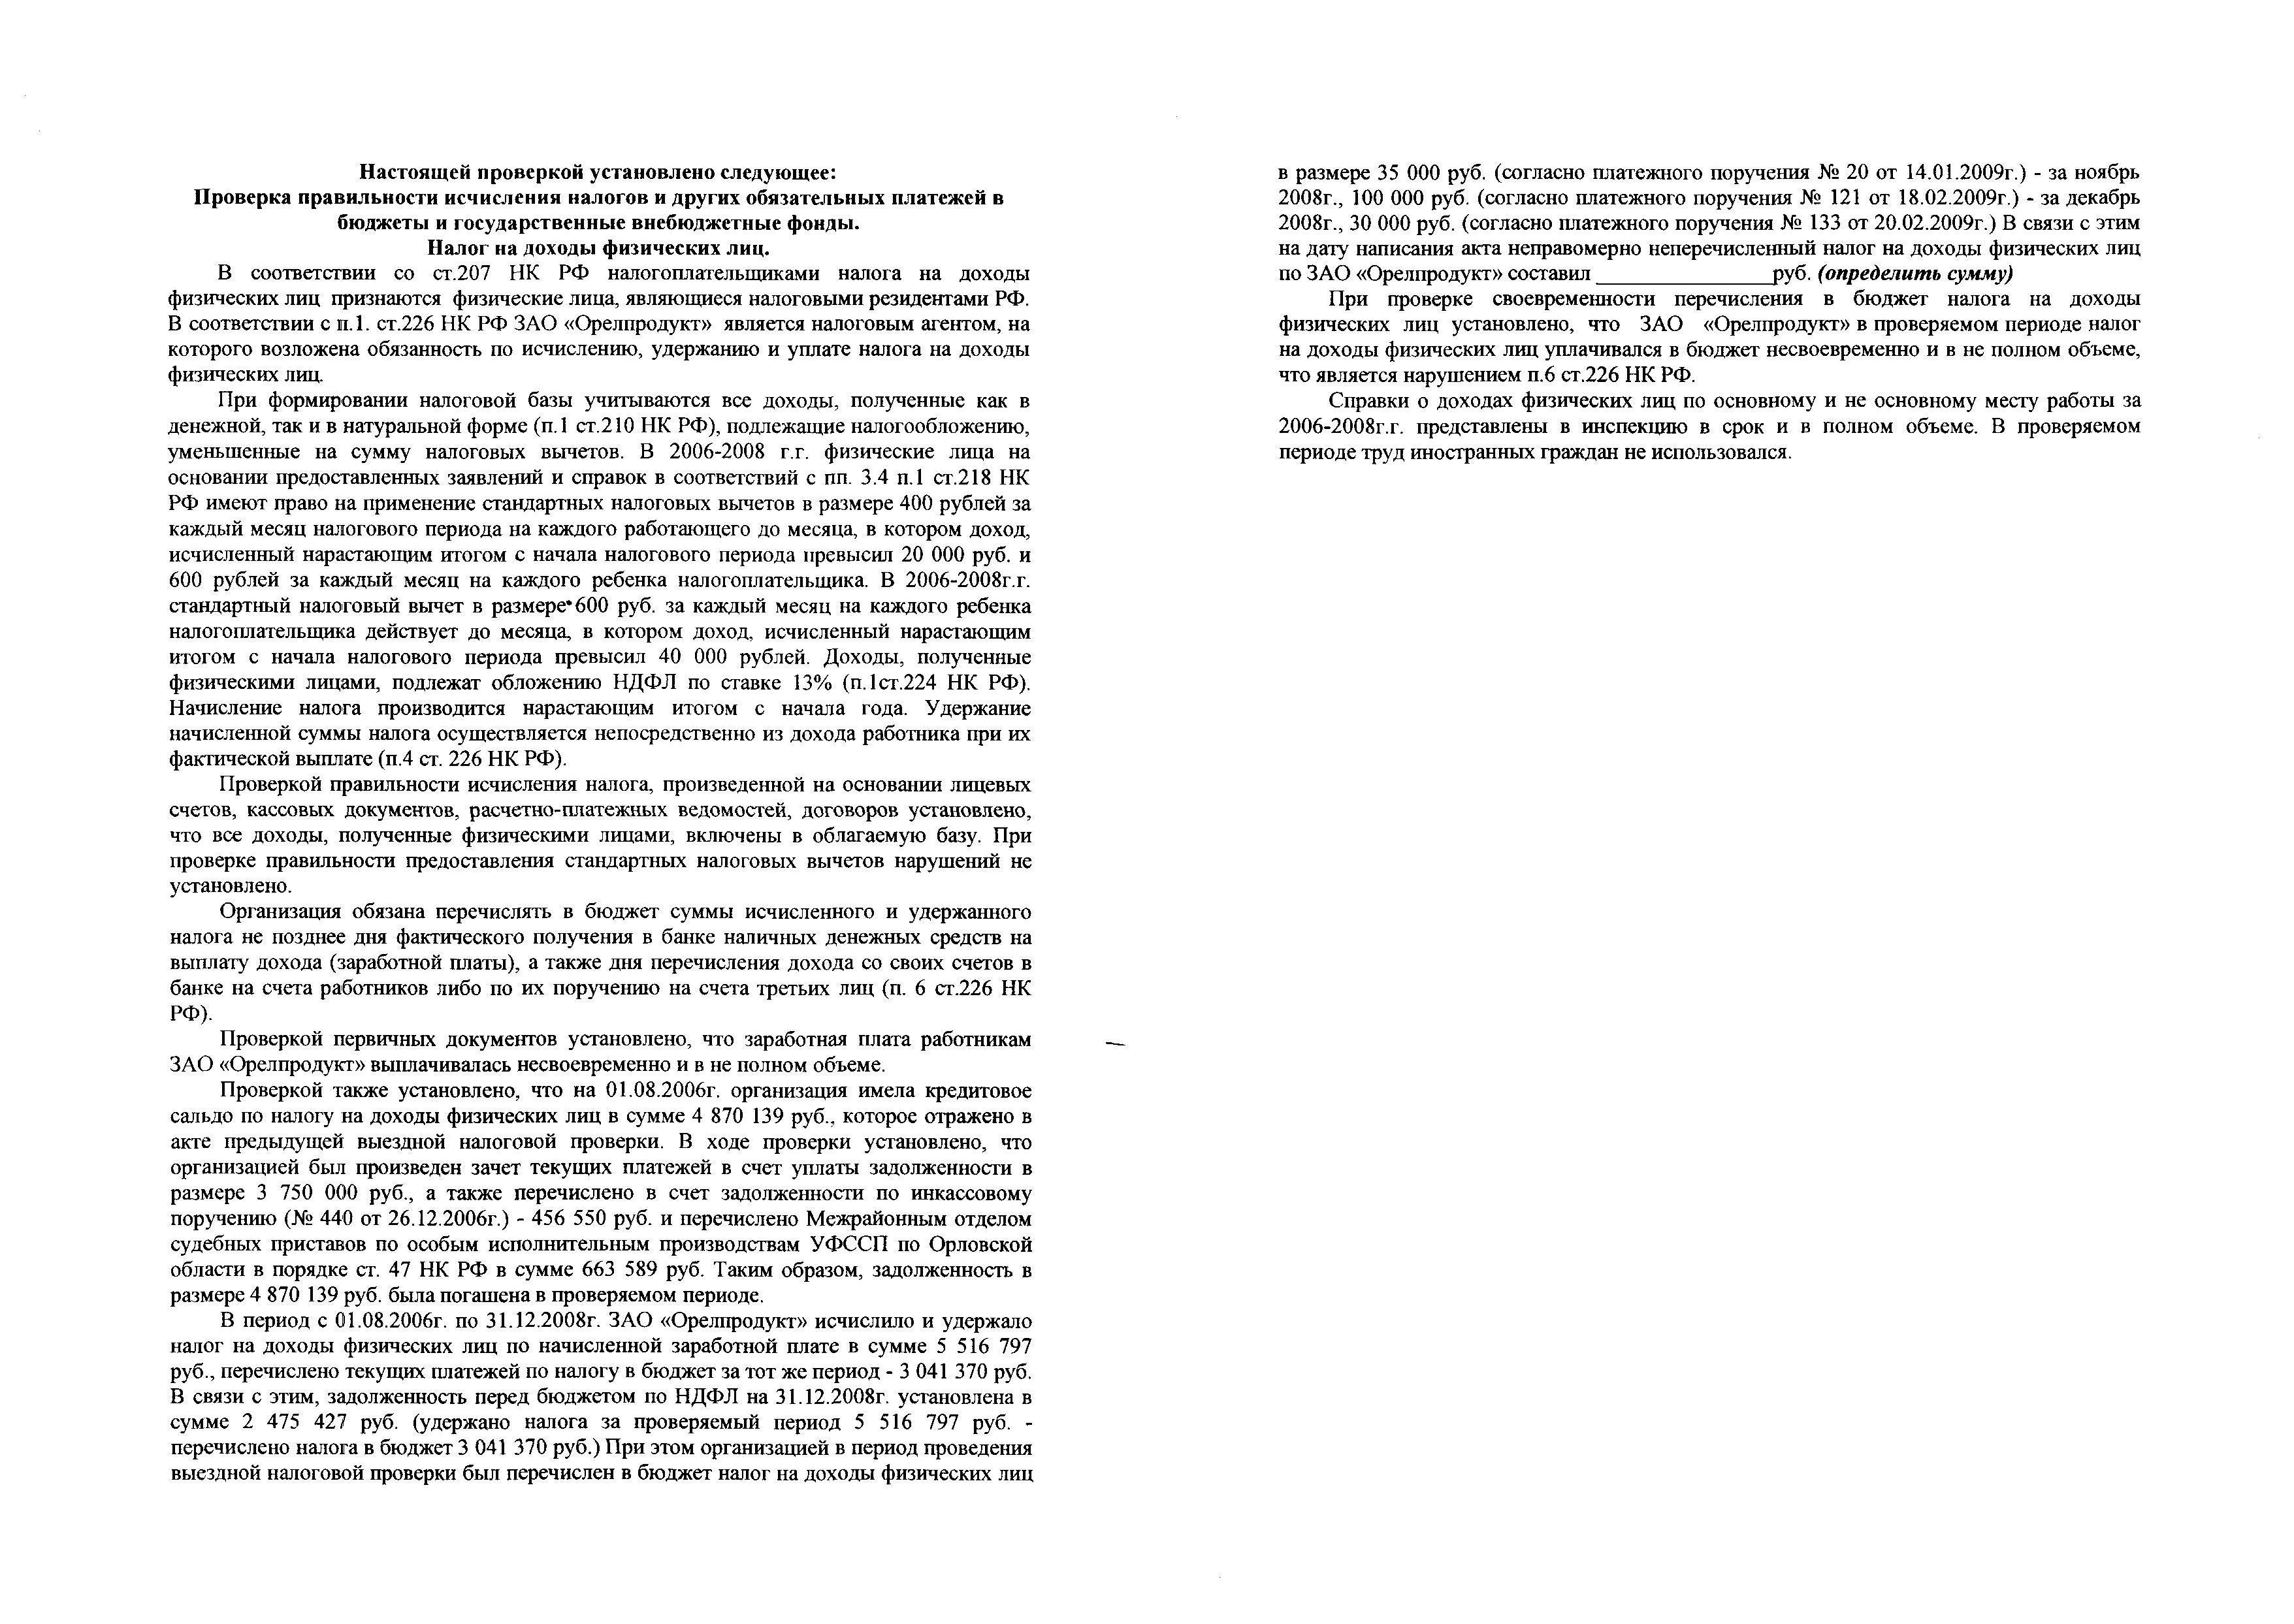 nos contributions Задачи проверка НДФЛ проверка НДС